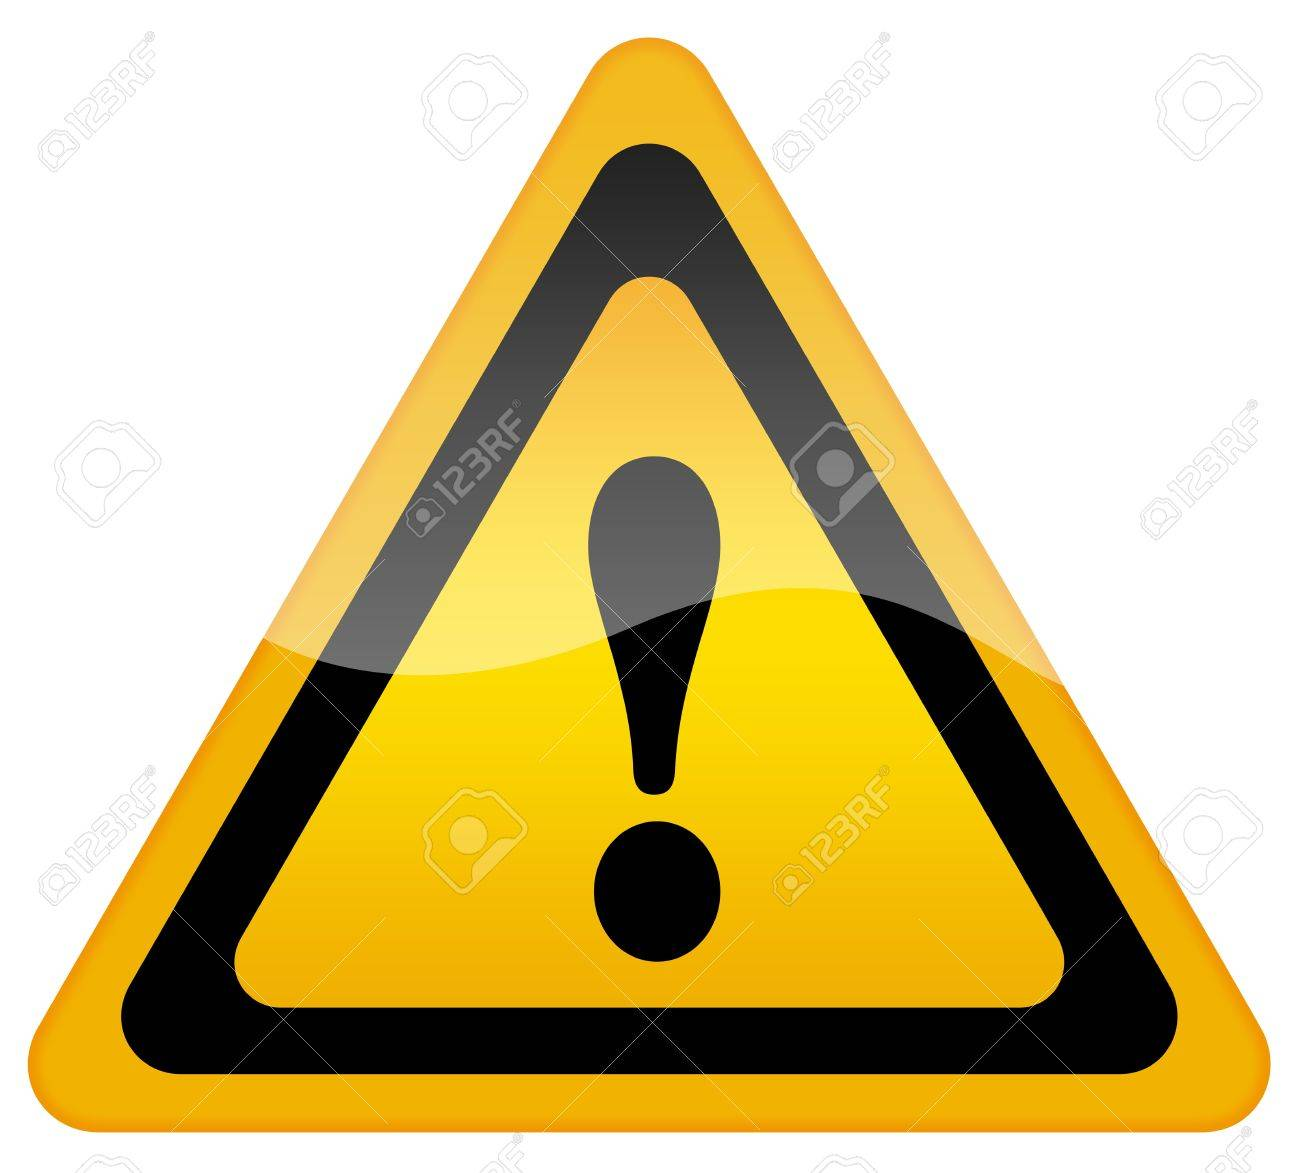 Danger warning sign Stock Photo - 9156452